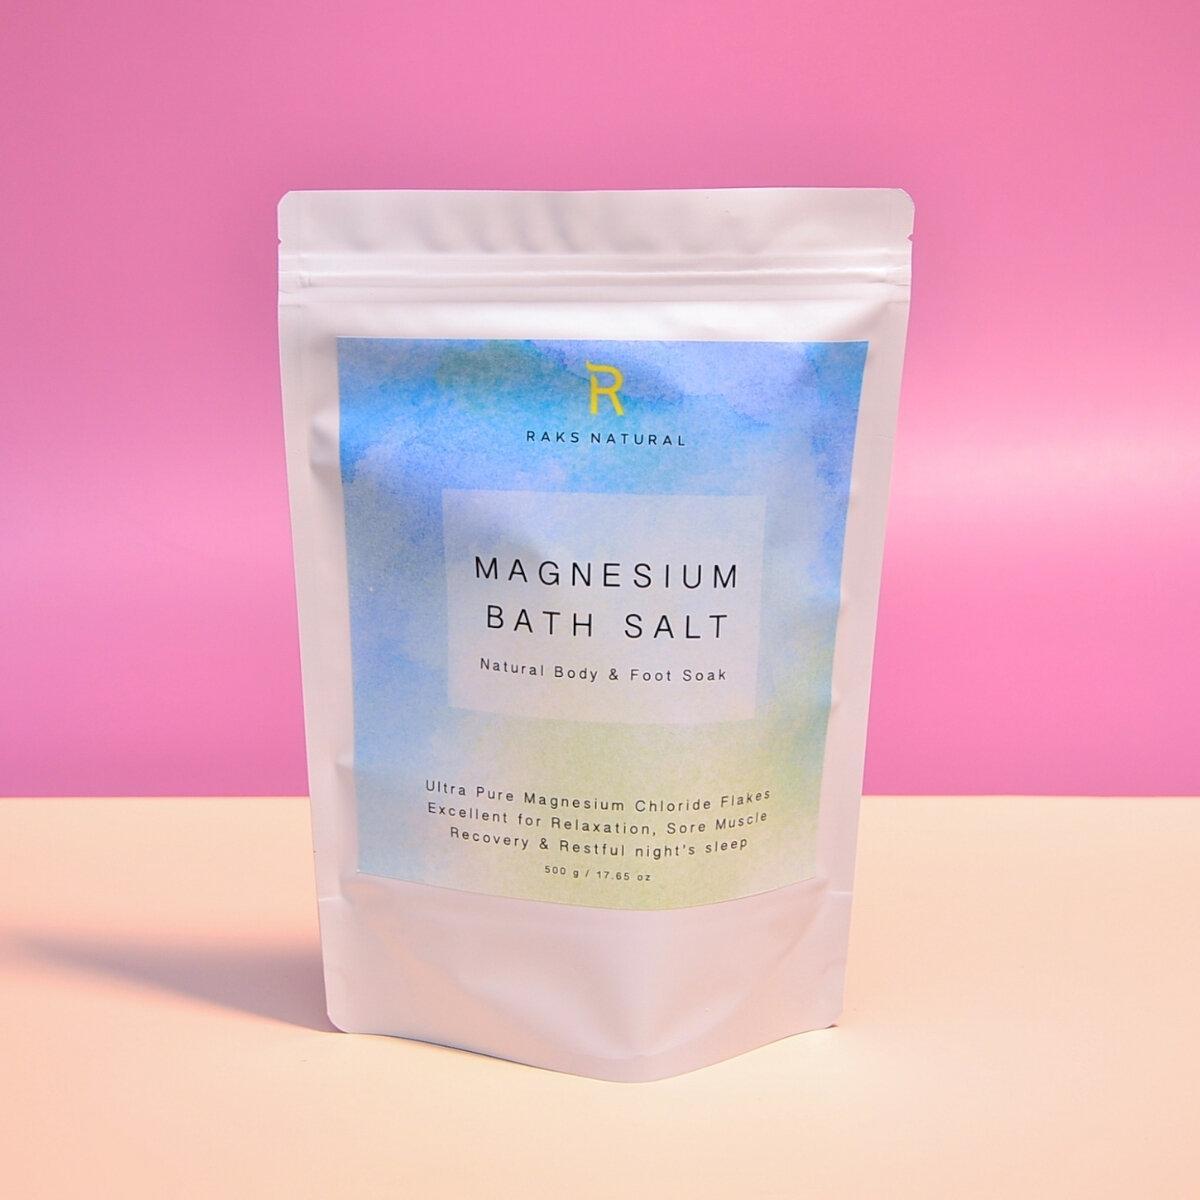 Pure Magnesium Bath Salt for Bath & Foot Soak